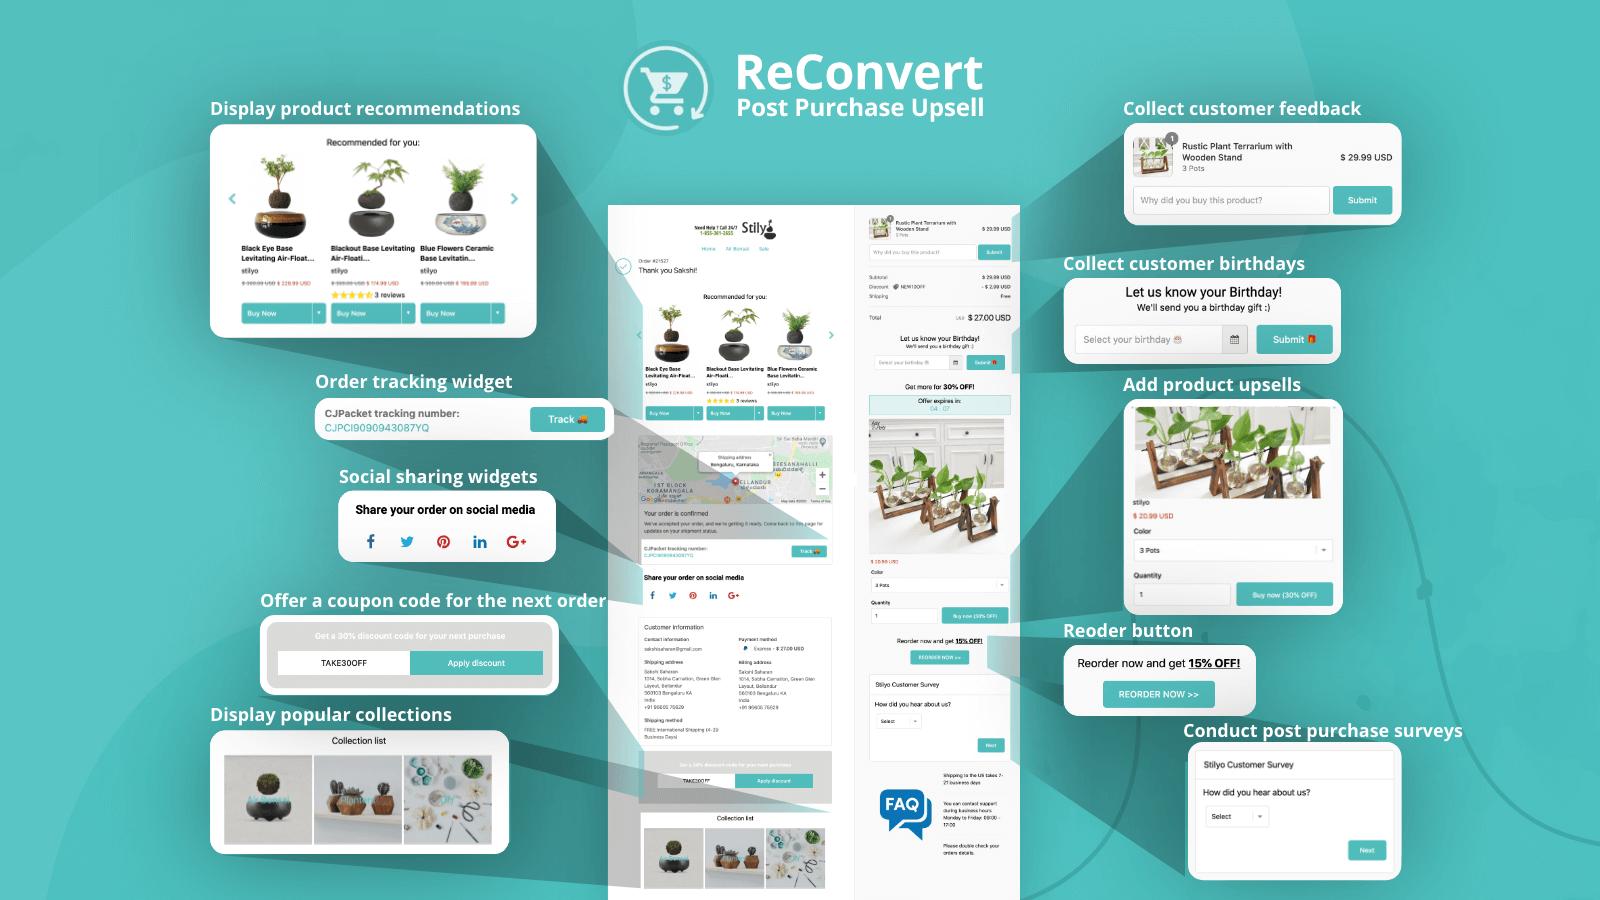 Reconvert Upsell